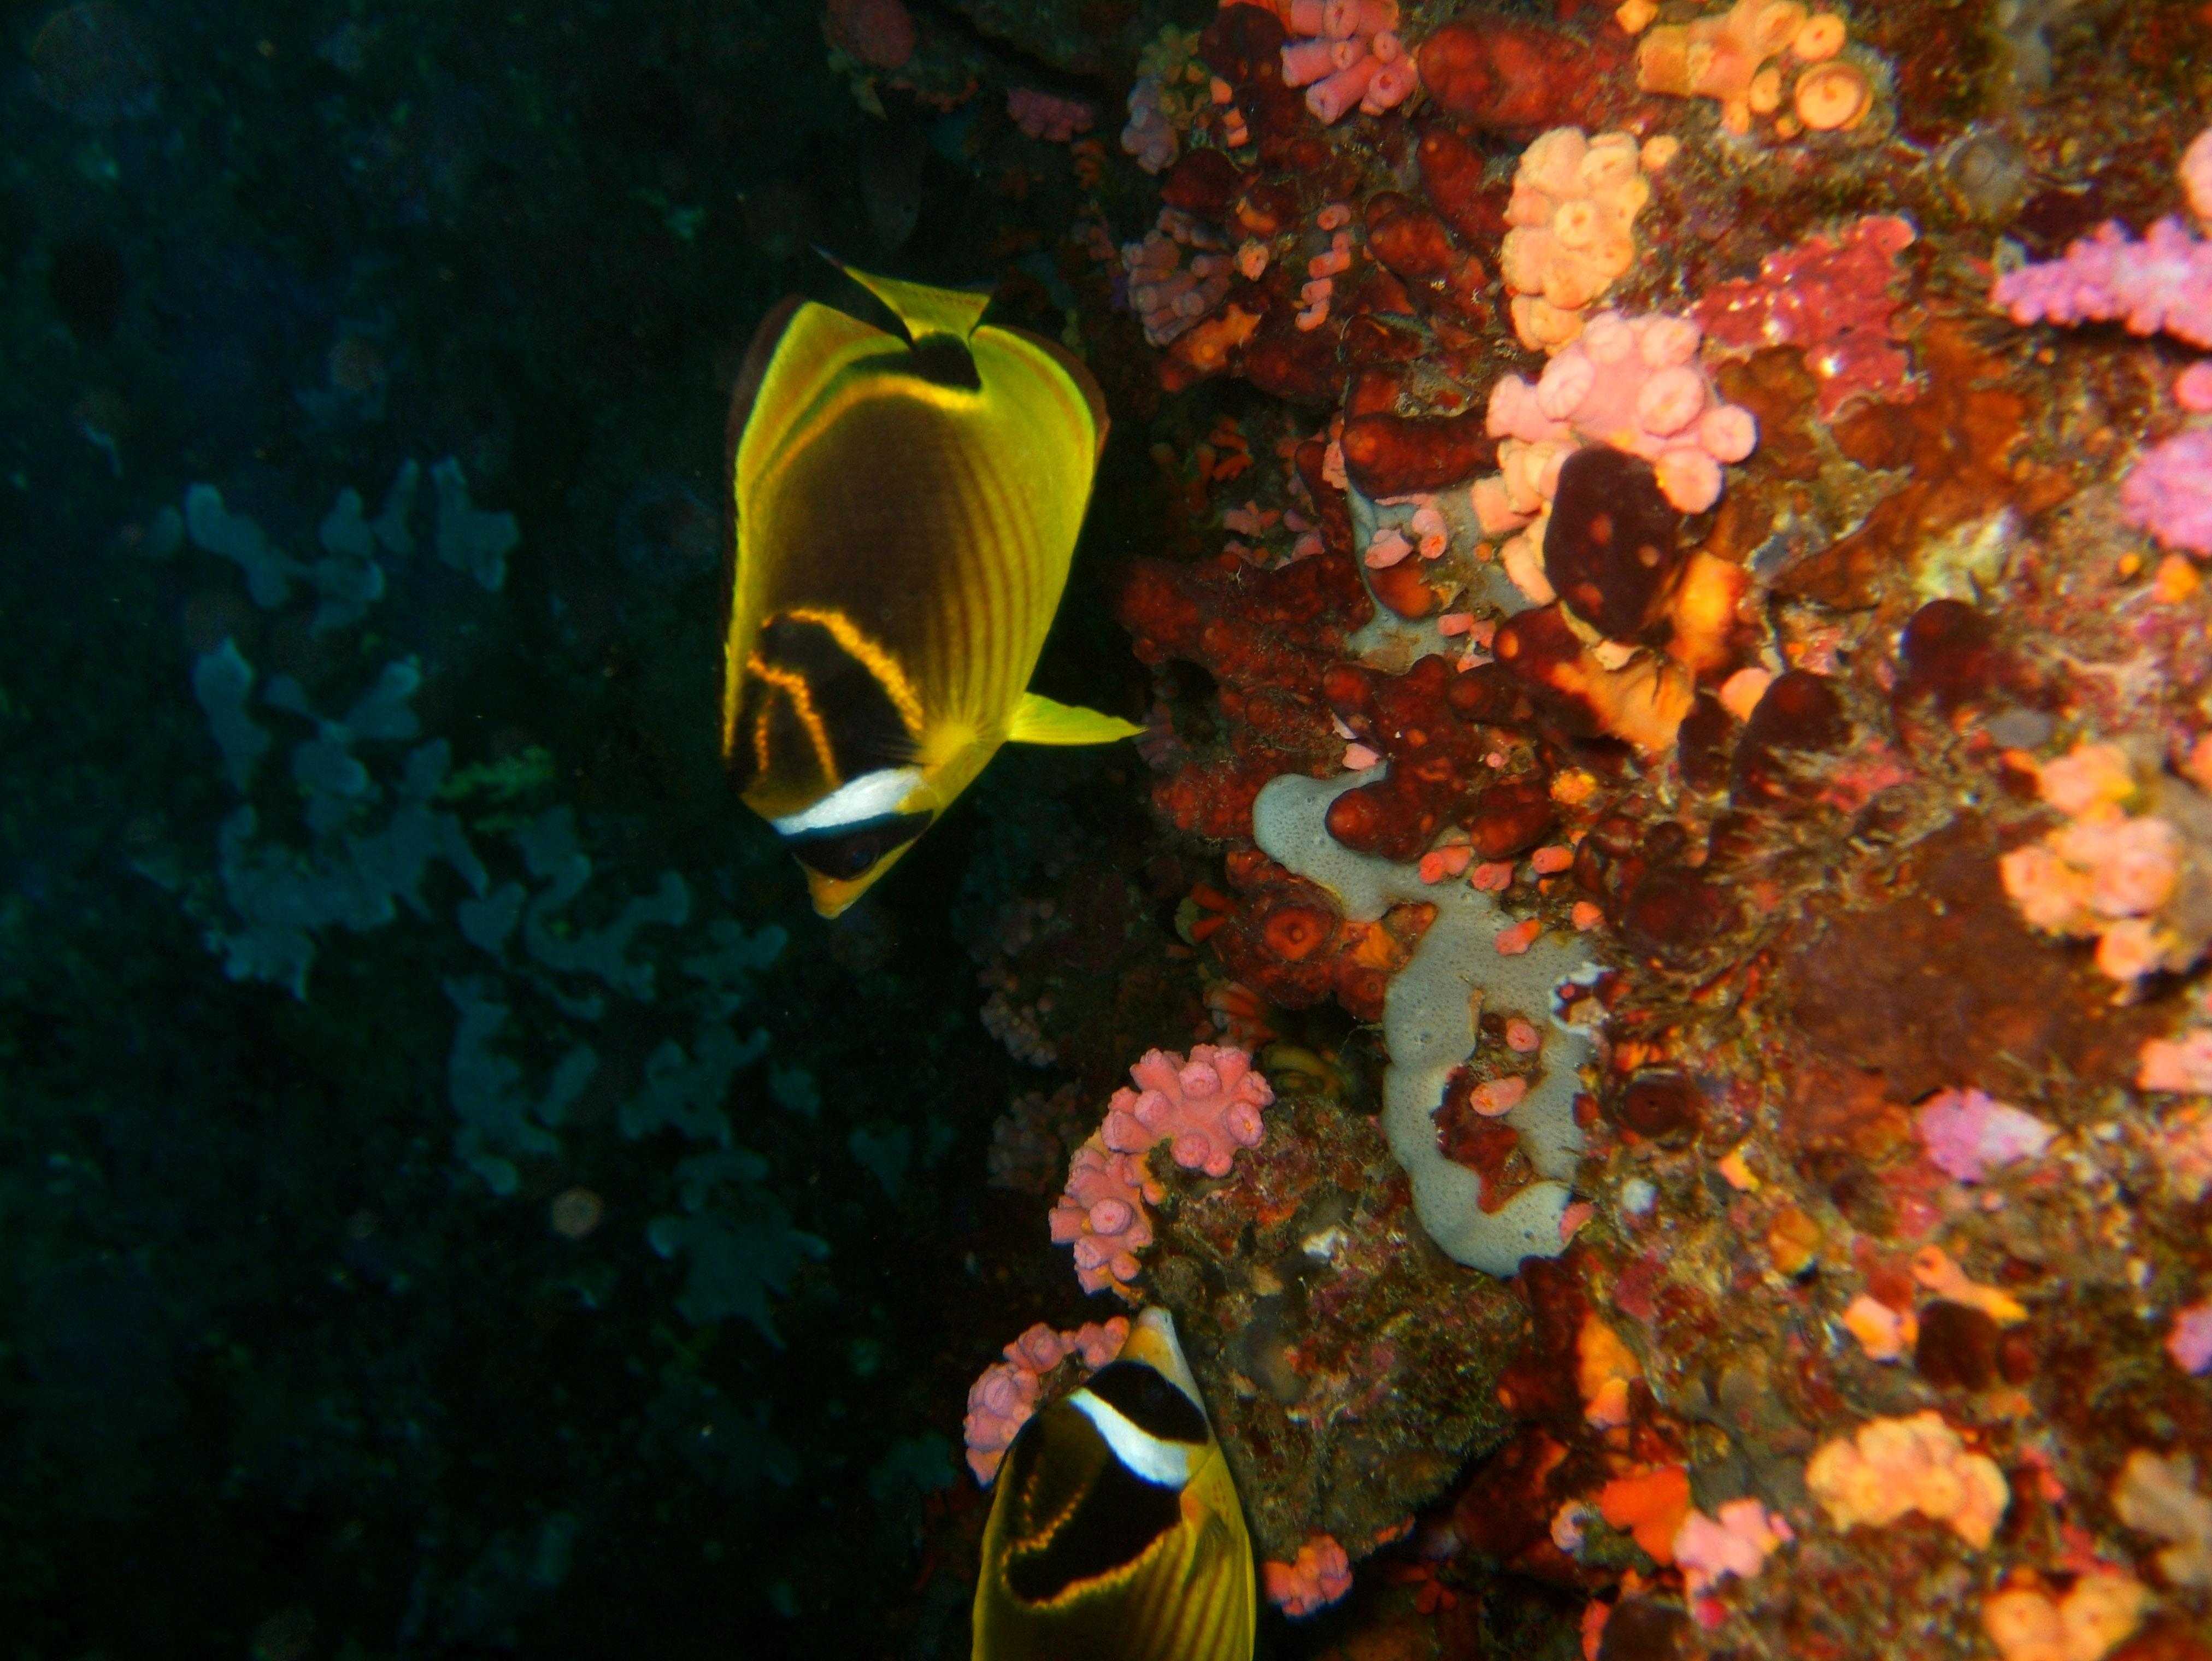 Philippines Cebu Moal Boal 20051227 Dive 1 Pescador Island 62